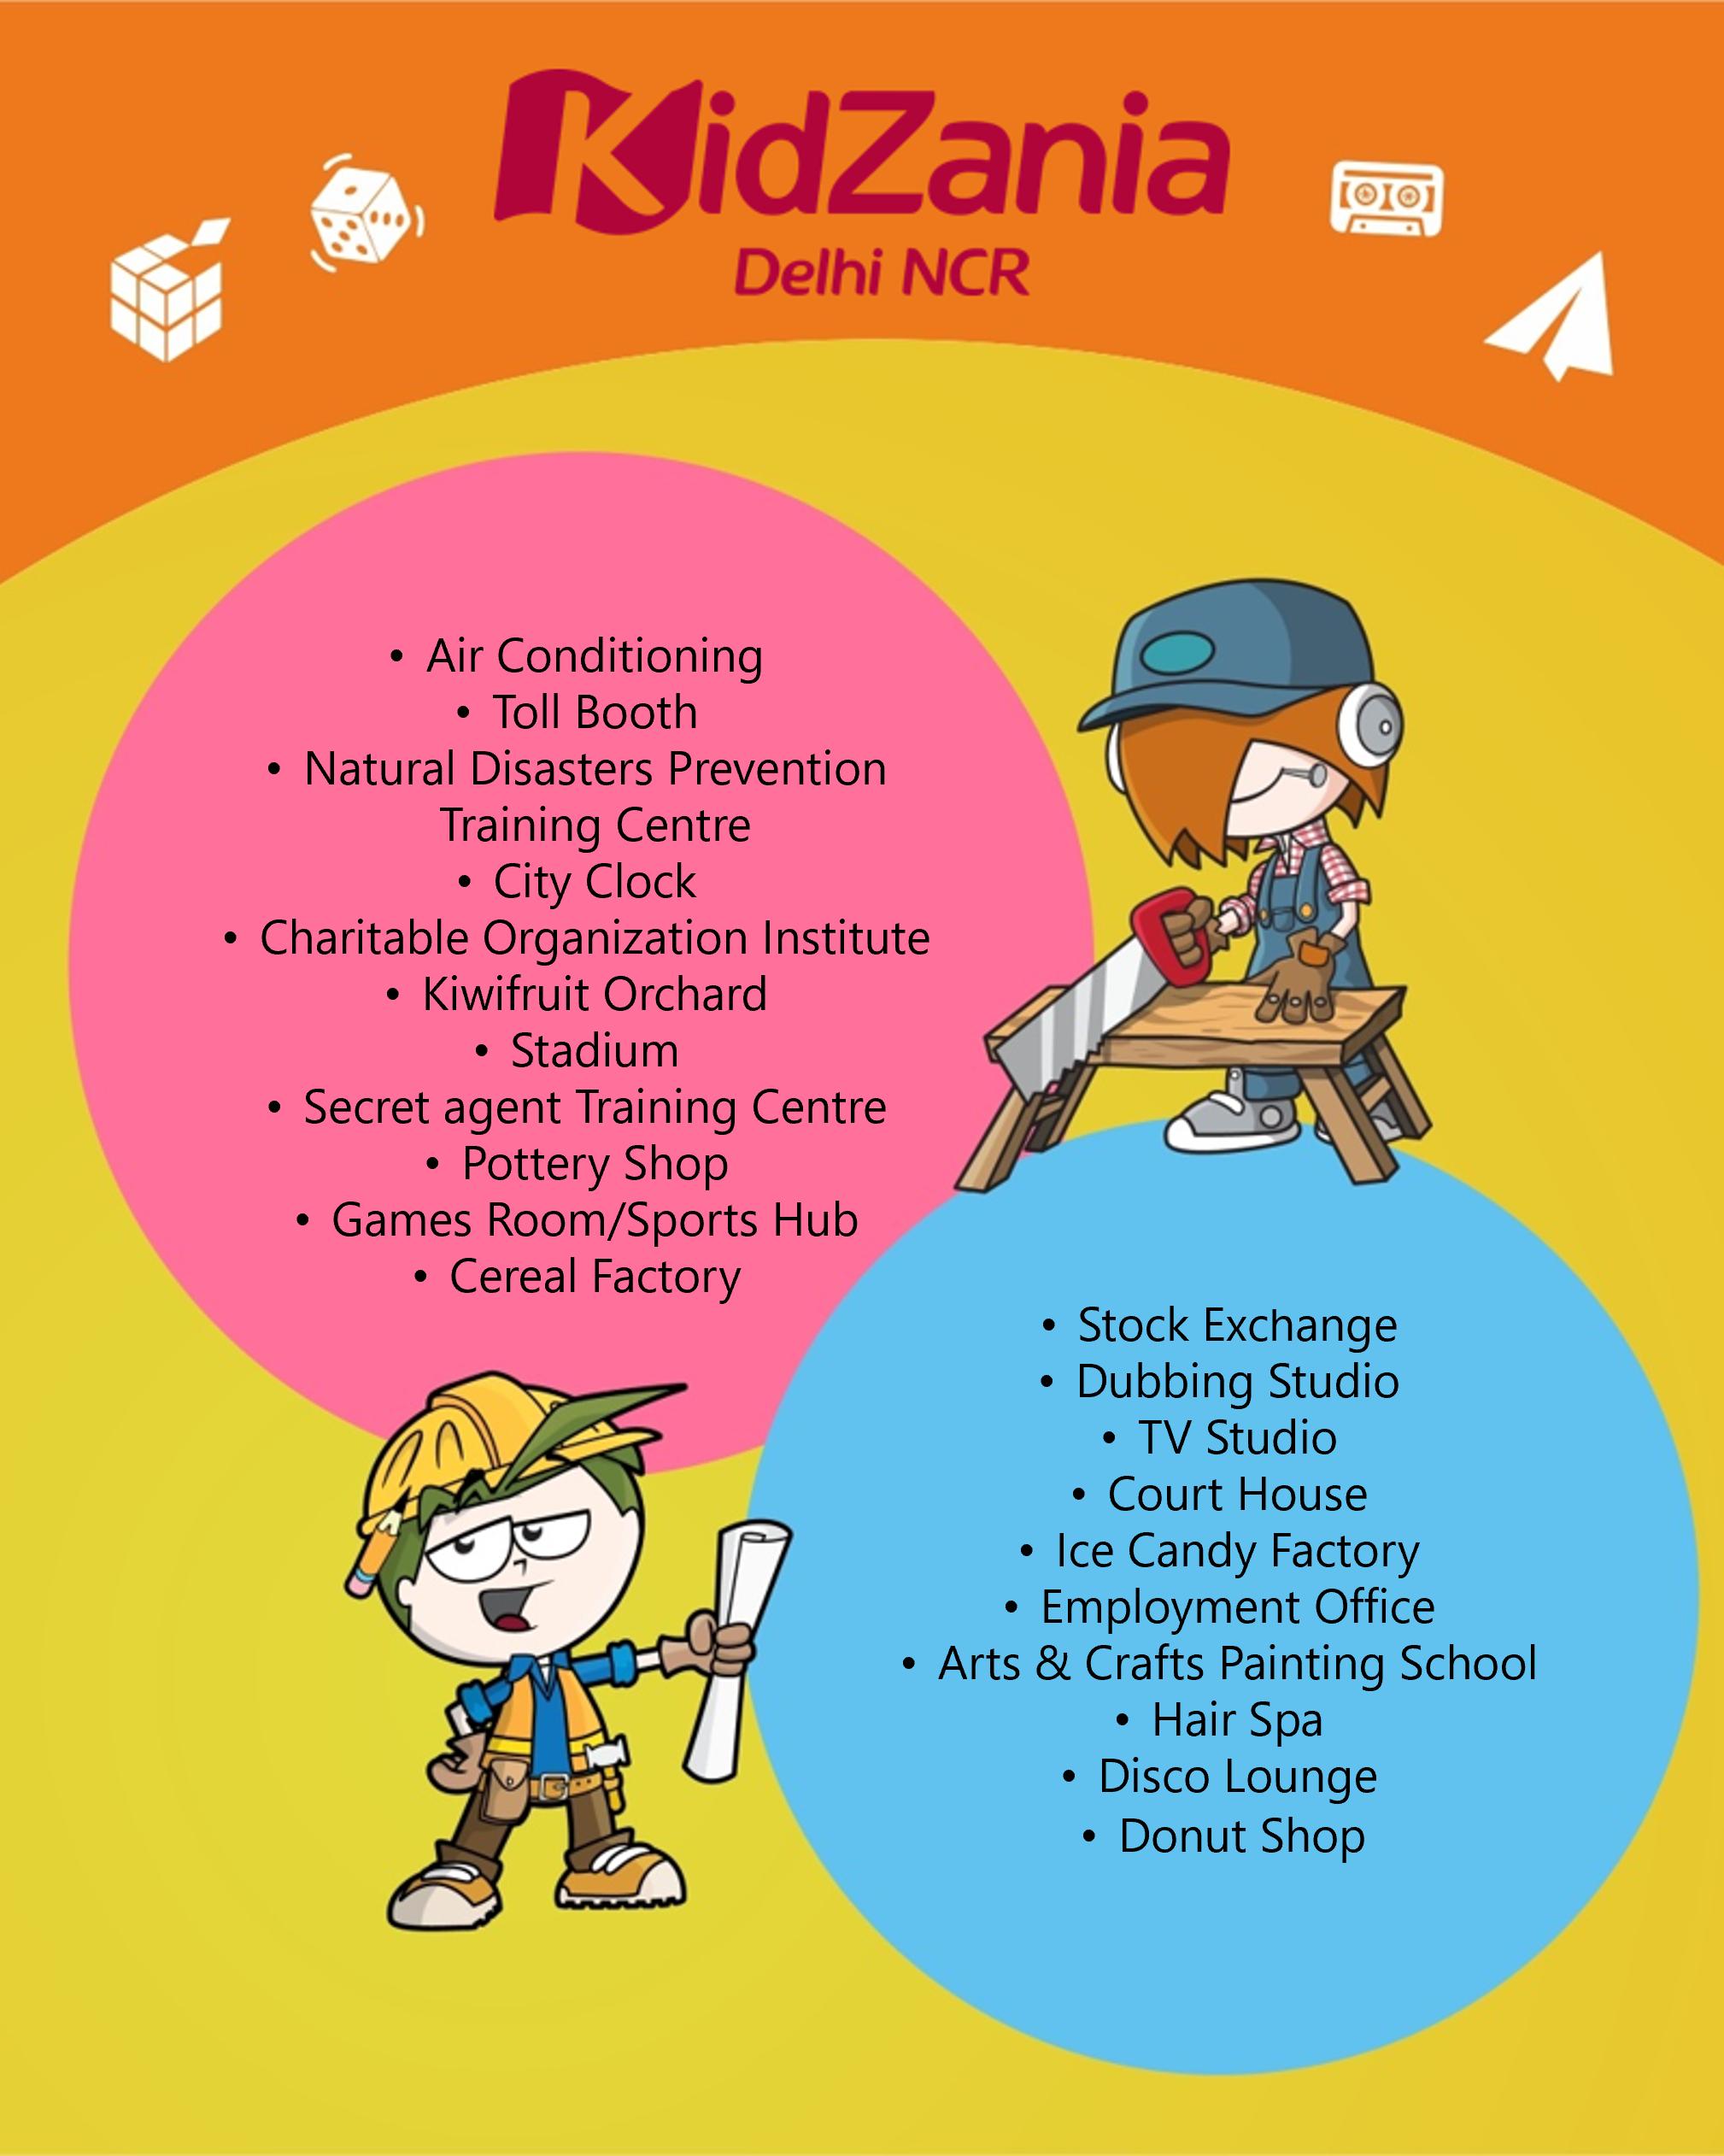 KidZania Delhi NCR temporarily Closed establishments